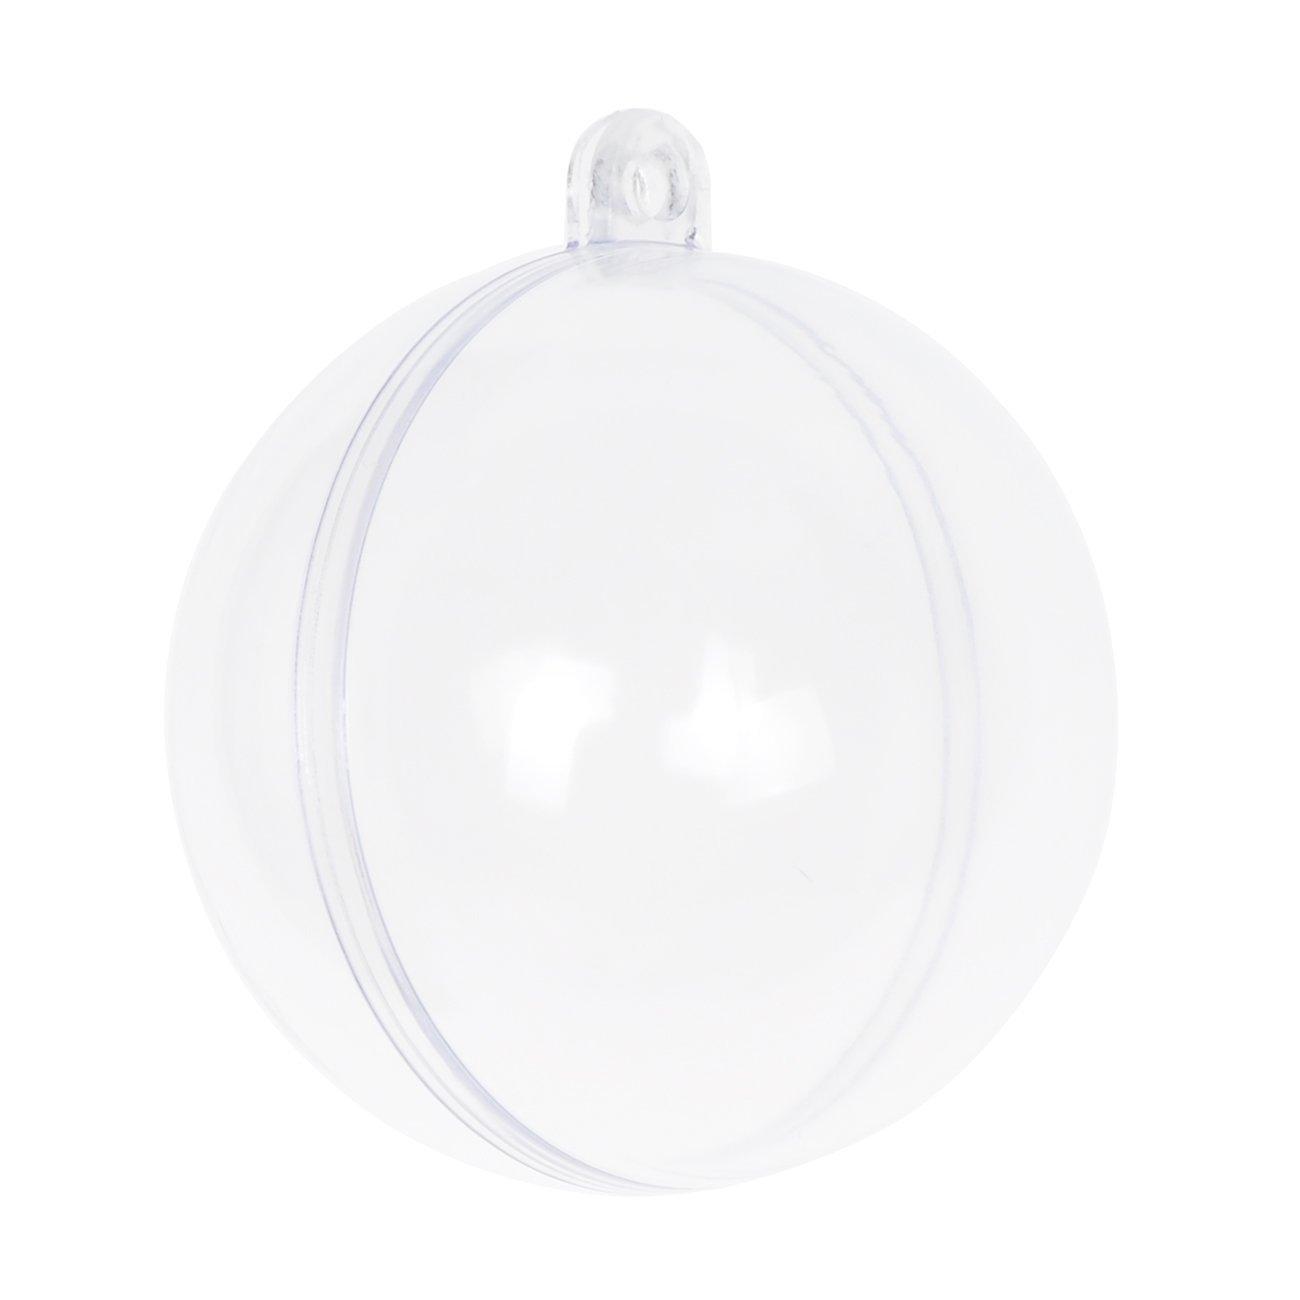 Clear plastic ornaments - Amazon Com Seekingtag Clear Diy Fillable Plastic Ball Craft Ornaments 50 Mm Pack Of 12 Home Kitchen